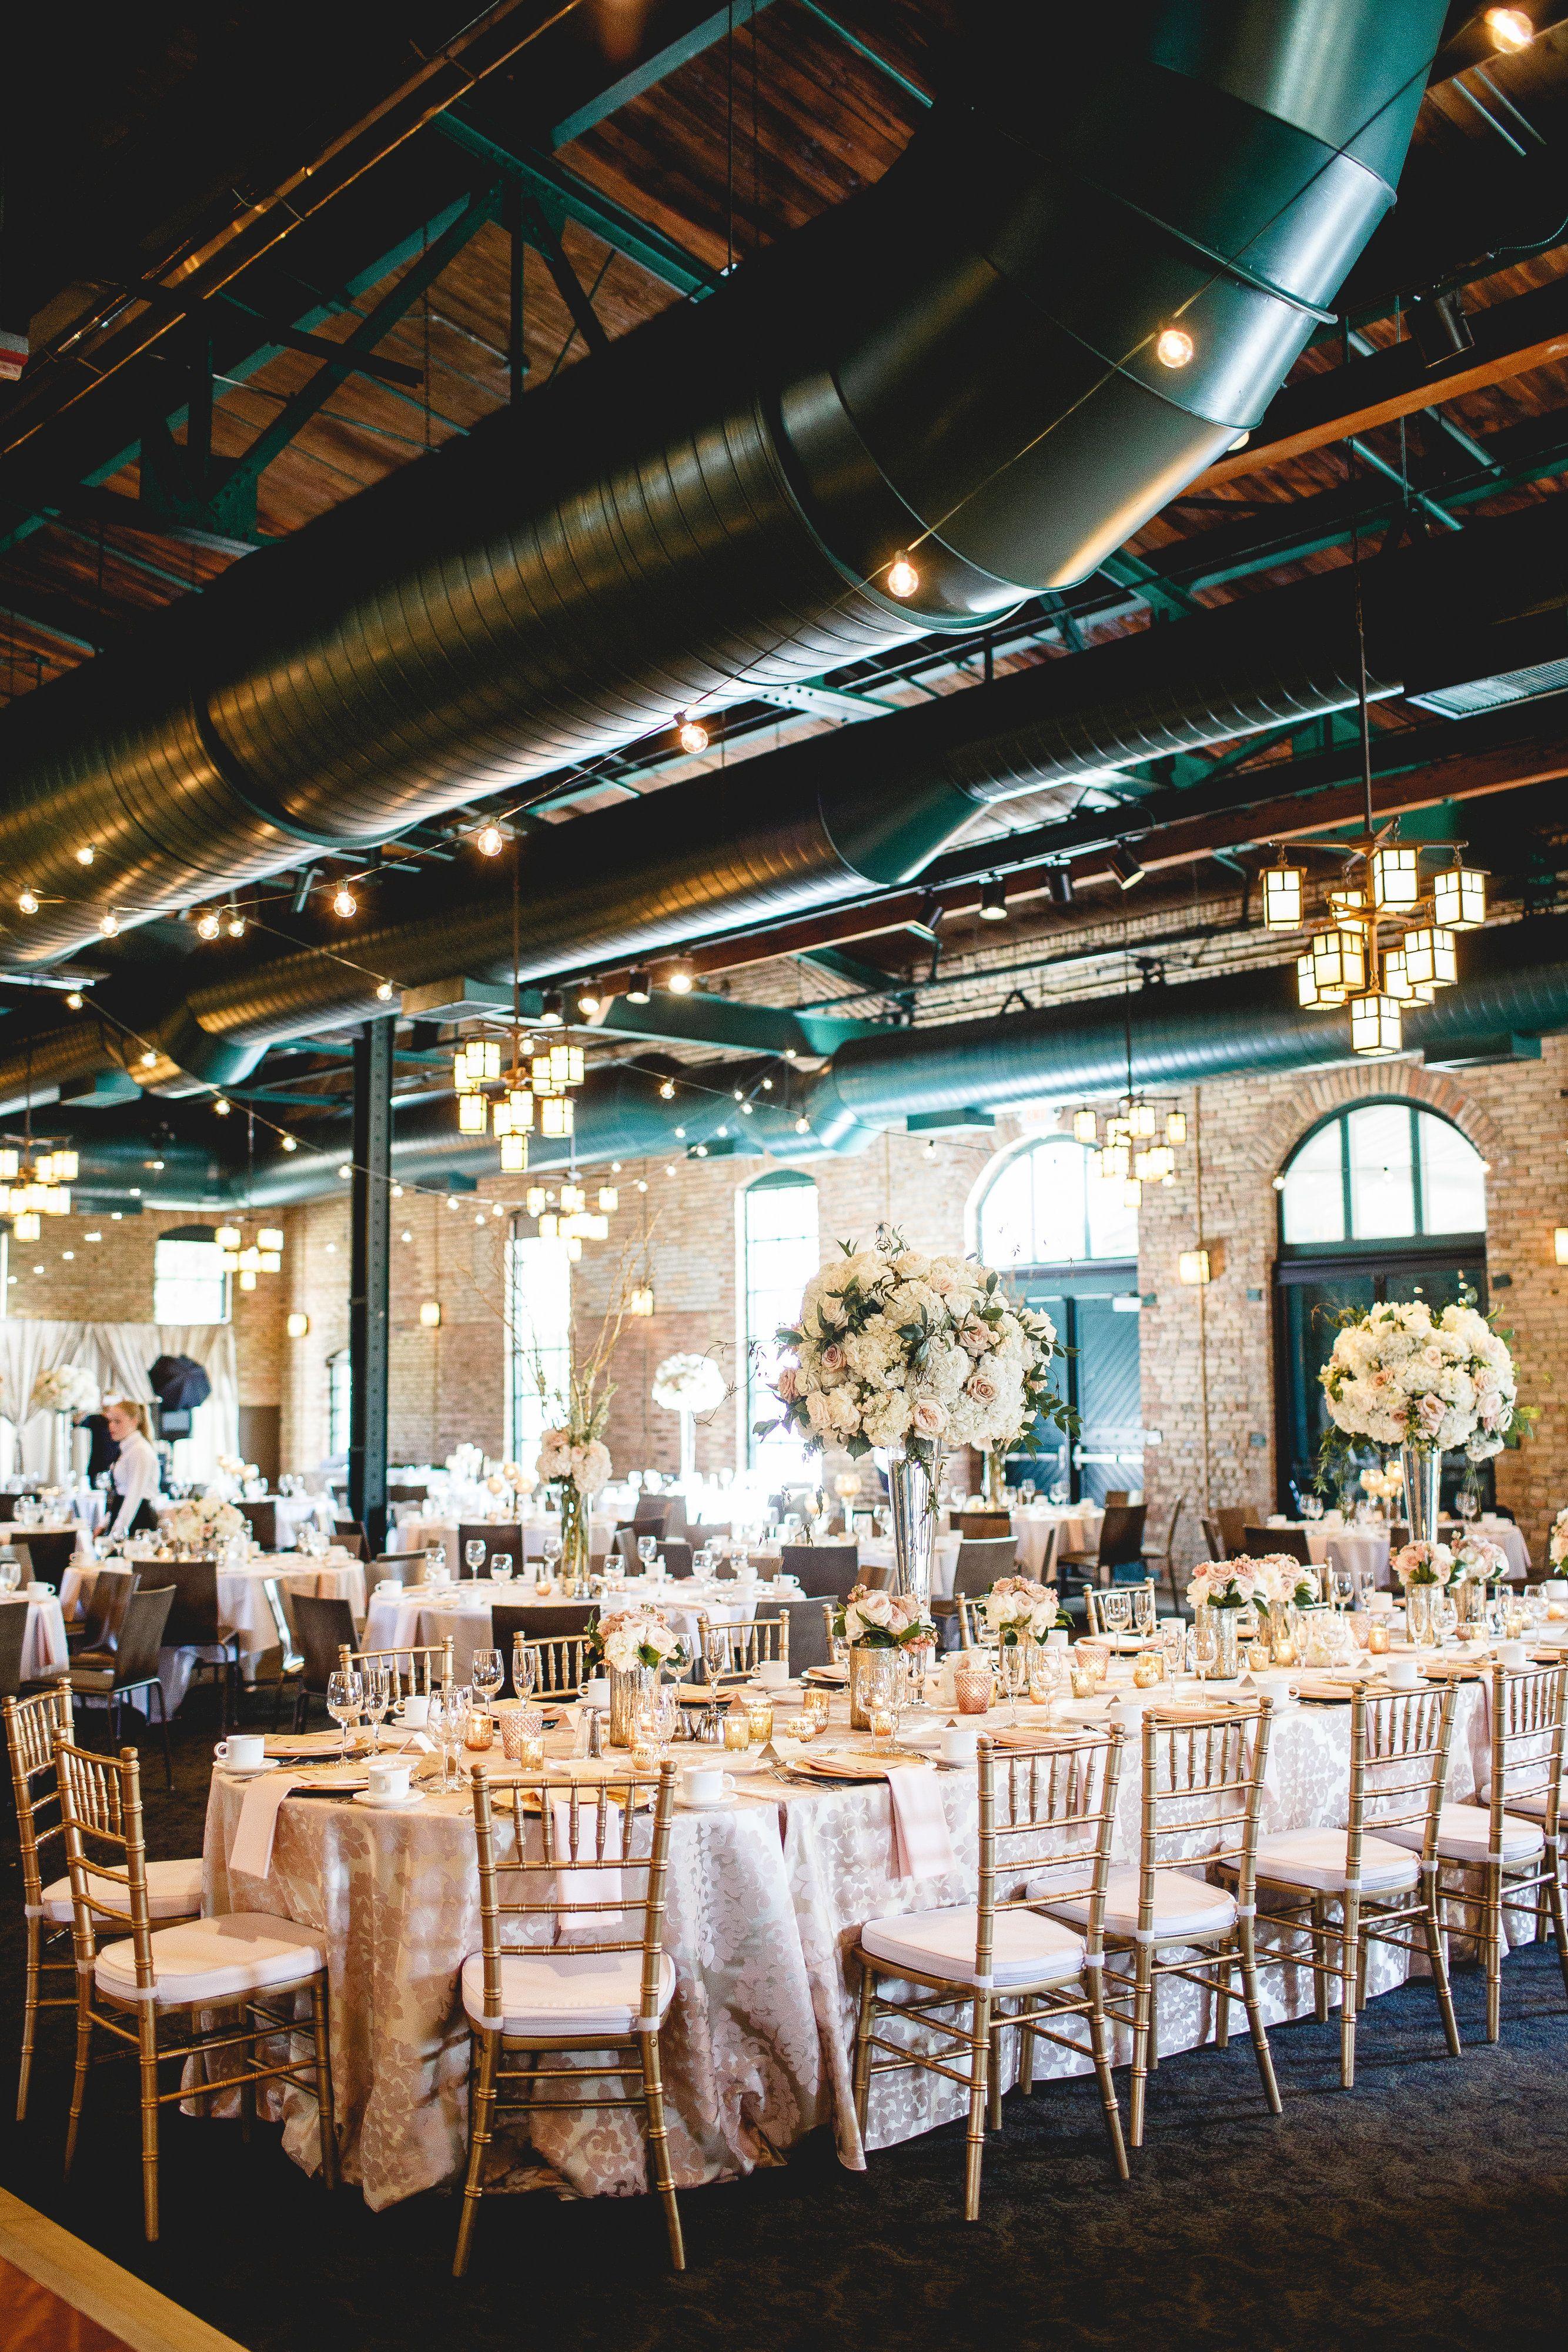 wedding halls st paul mn%0A Nicollet Island Pavilion Wedding with Jessica  u     Nate   Photography by Kelly  Brown Weddings   Nicollet Island Pavilion  exclusive venue    Pinterest